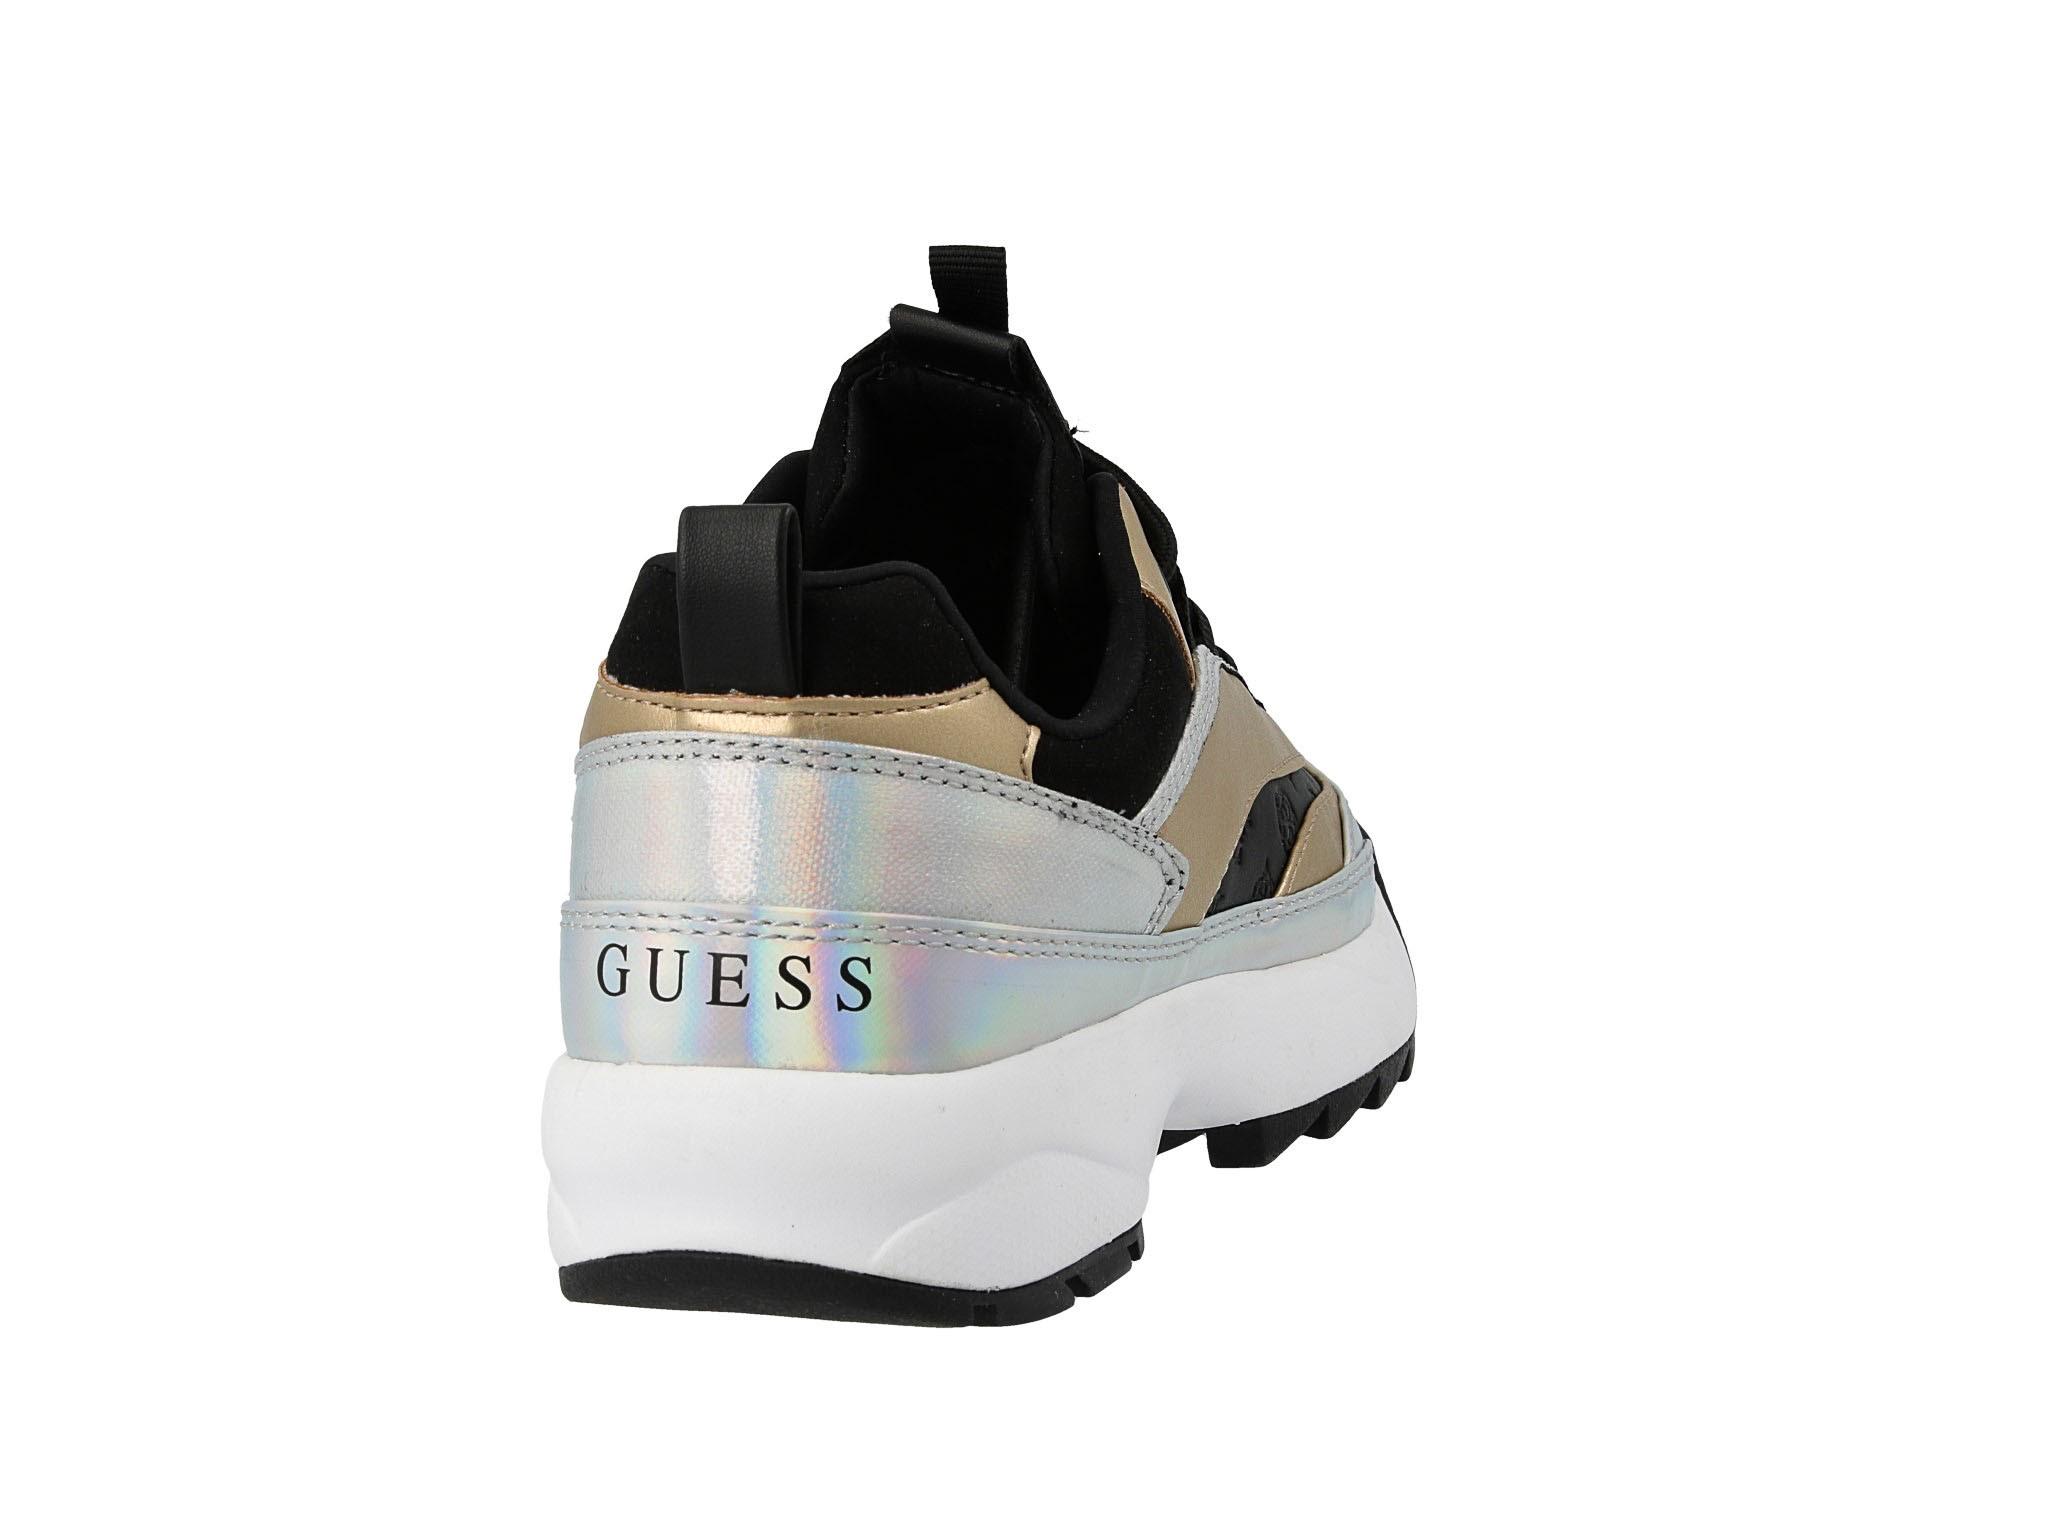 Sneakersy kaysie5 fl5kay lel12 blackgold, Guess